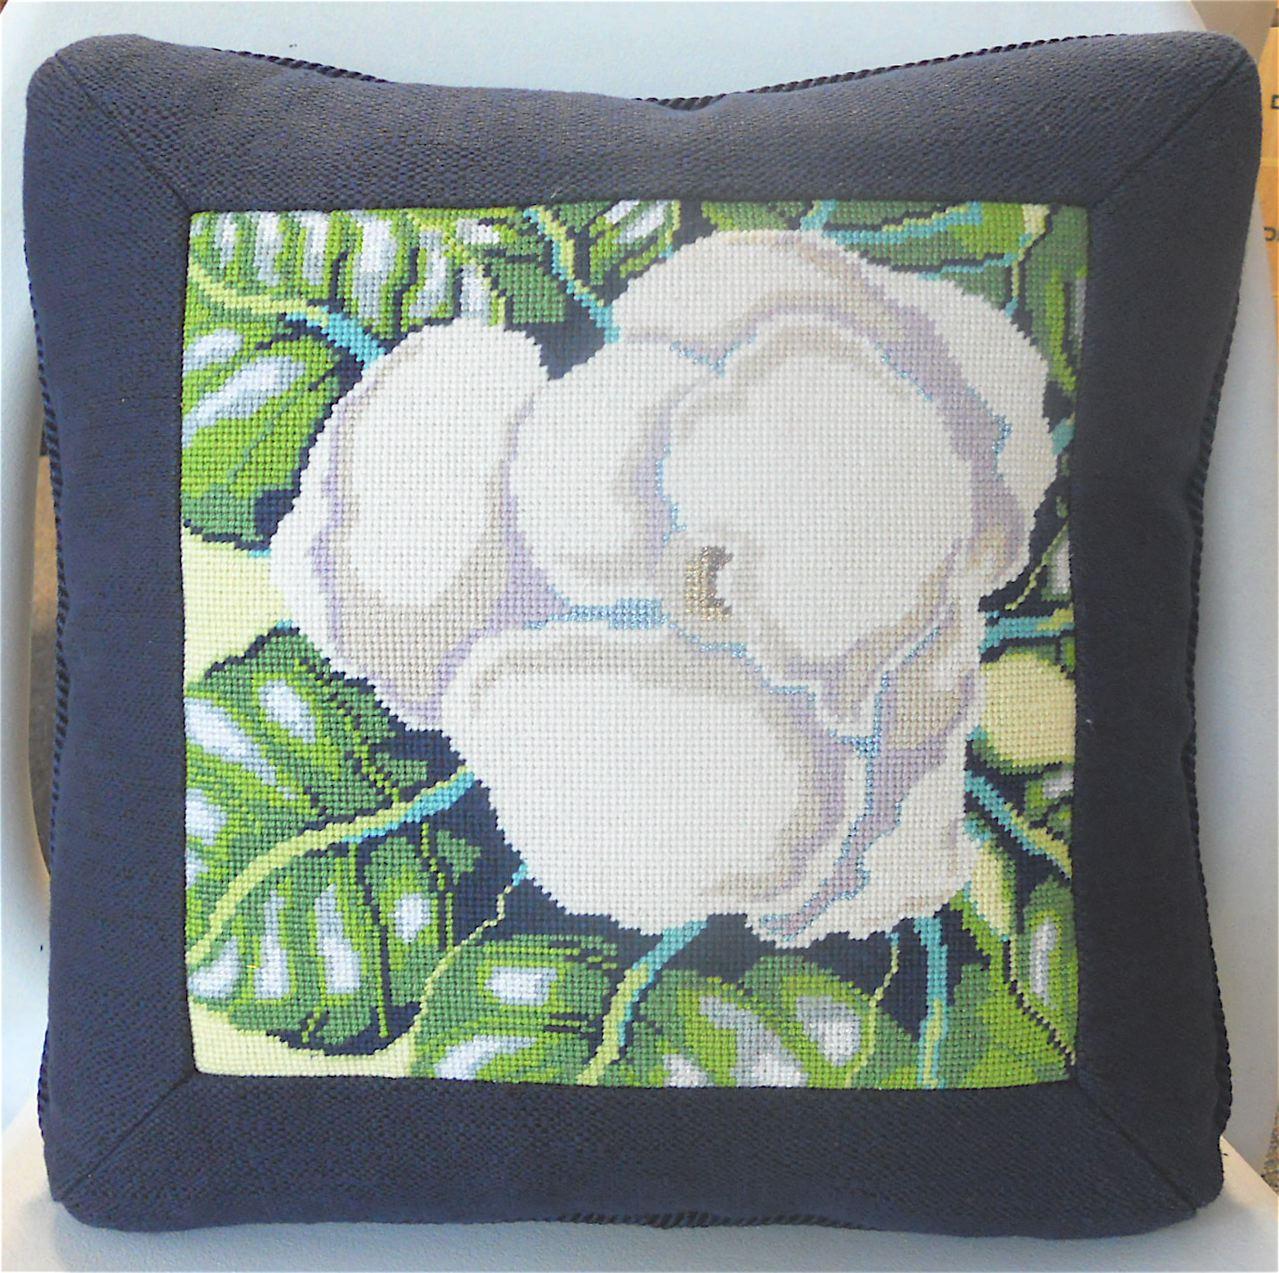 Some special pillows  nimbleneedlenjcom